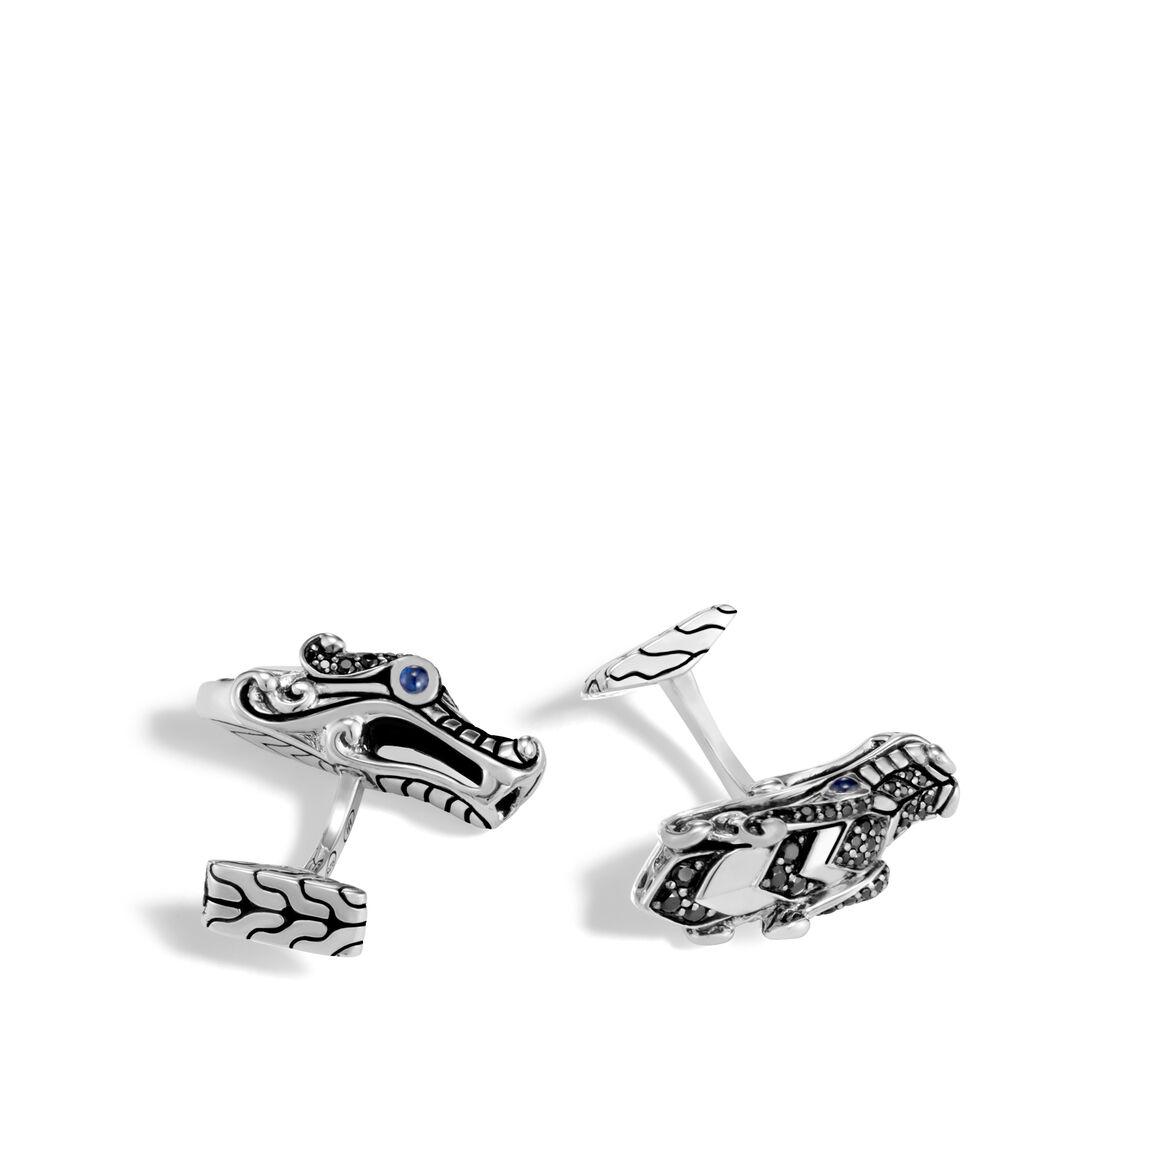 Legends Naga Cufflinks in Silver with Gemstone